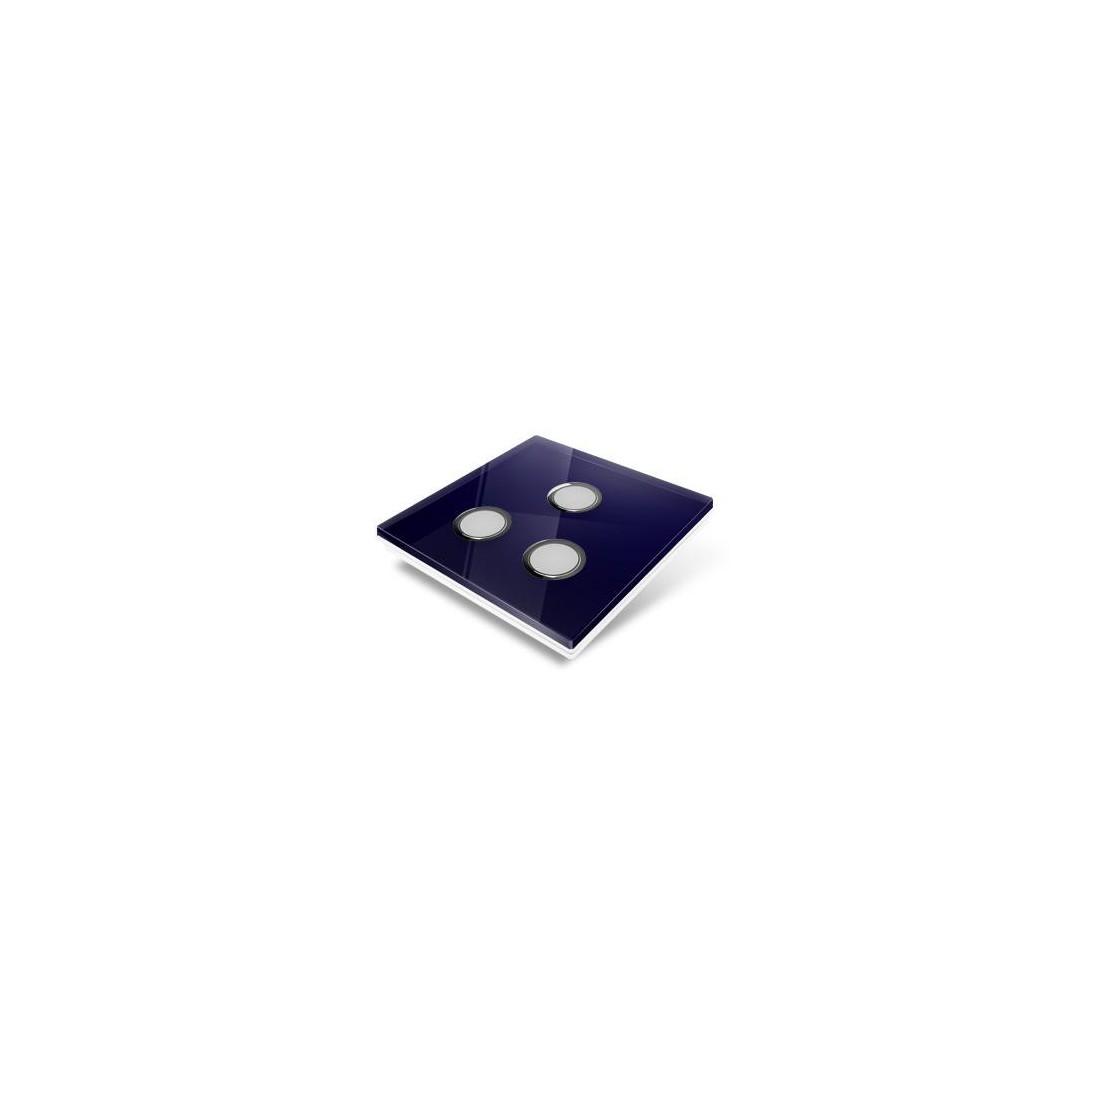 Tampa de cobertura para interruptor Edisio - cristal azul-noite